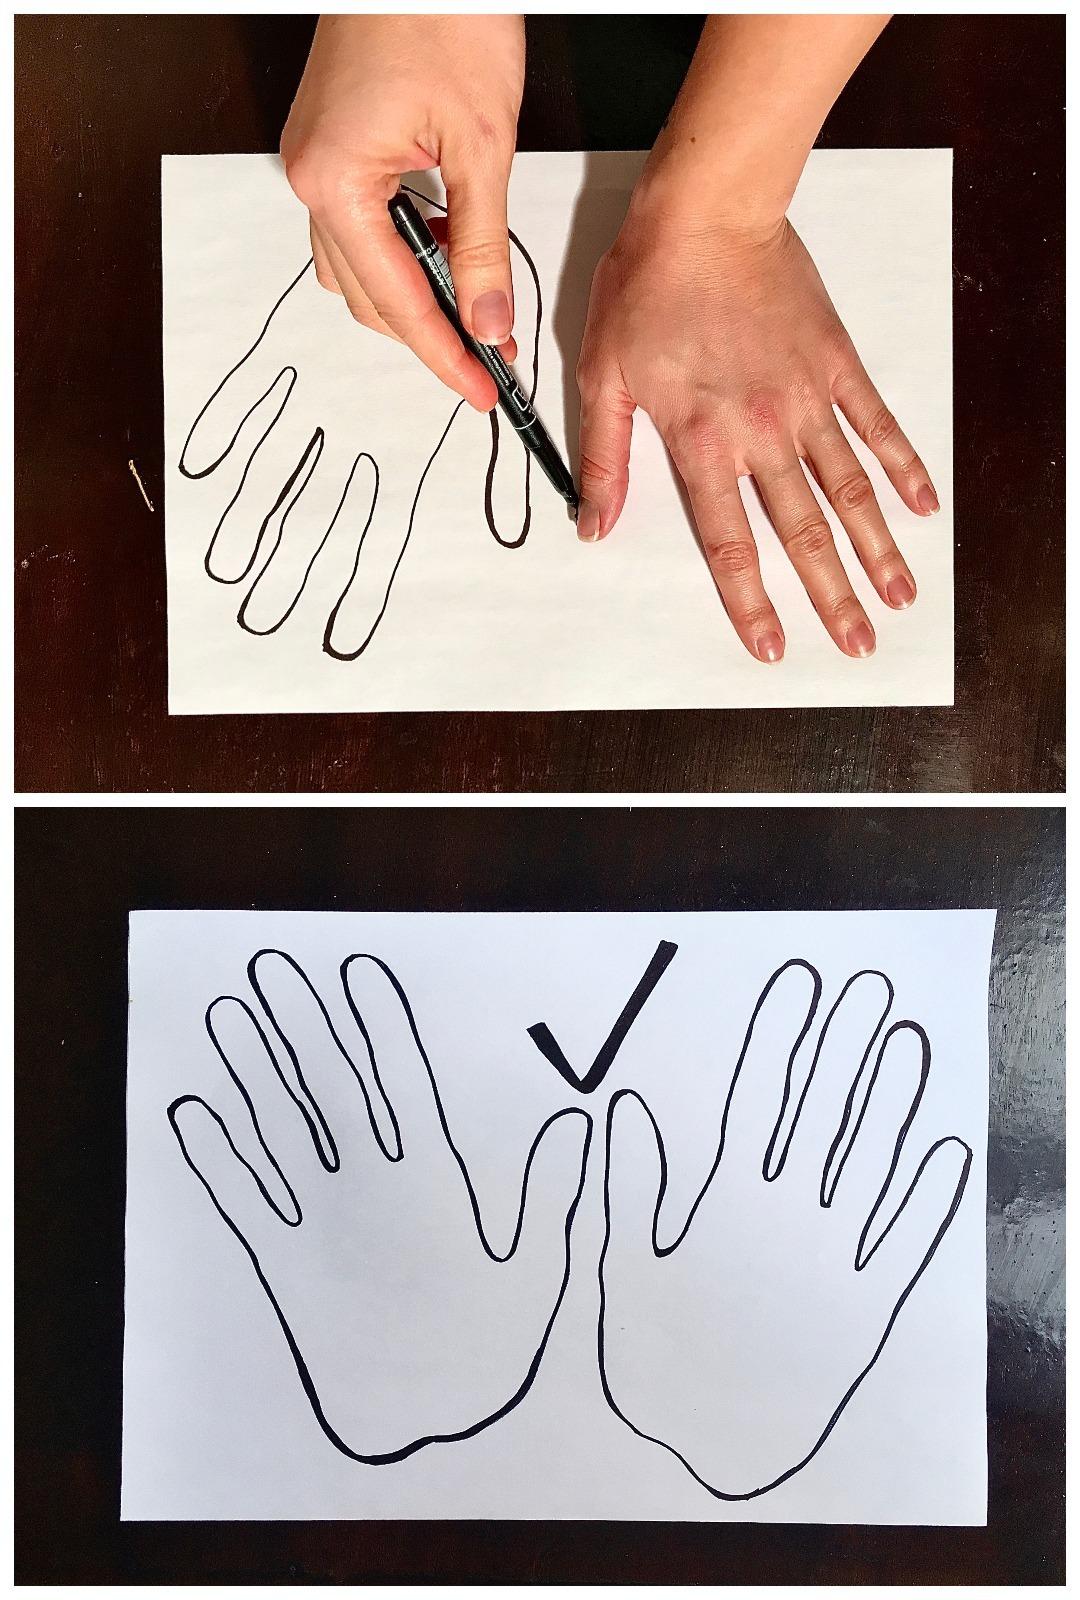 открытка обводим руку шелковой ткани